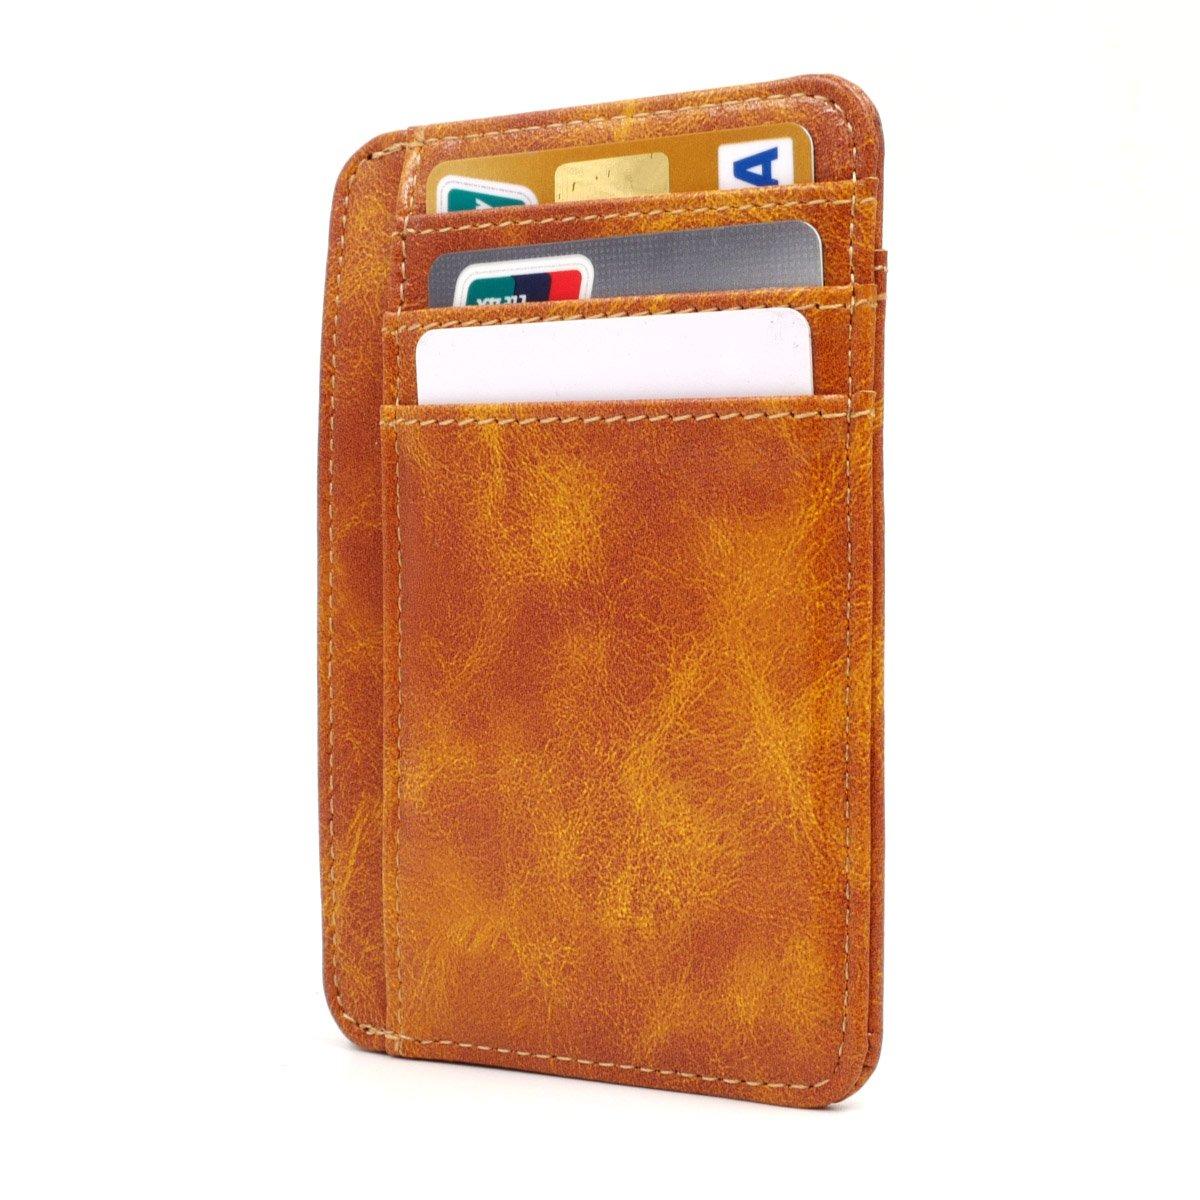 Kandouren Slim Minimalist RFID Leather Wallets,Front Pocket Wallet,Credit Card Holder for Men /& Women,Money Clip